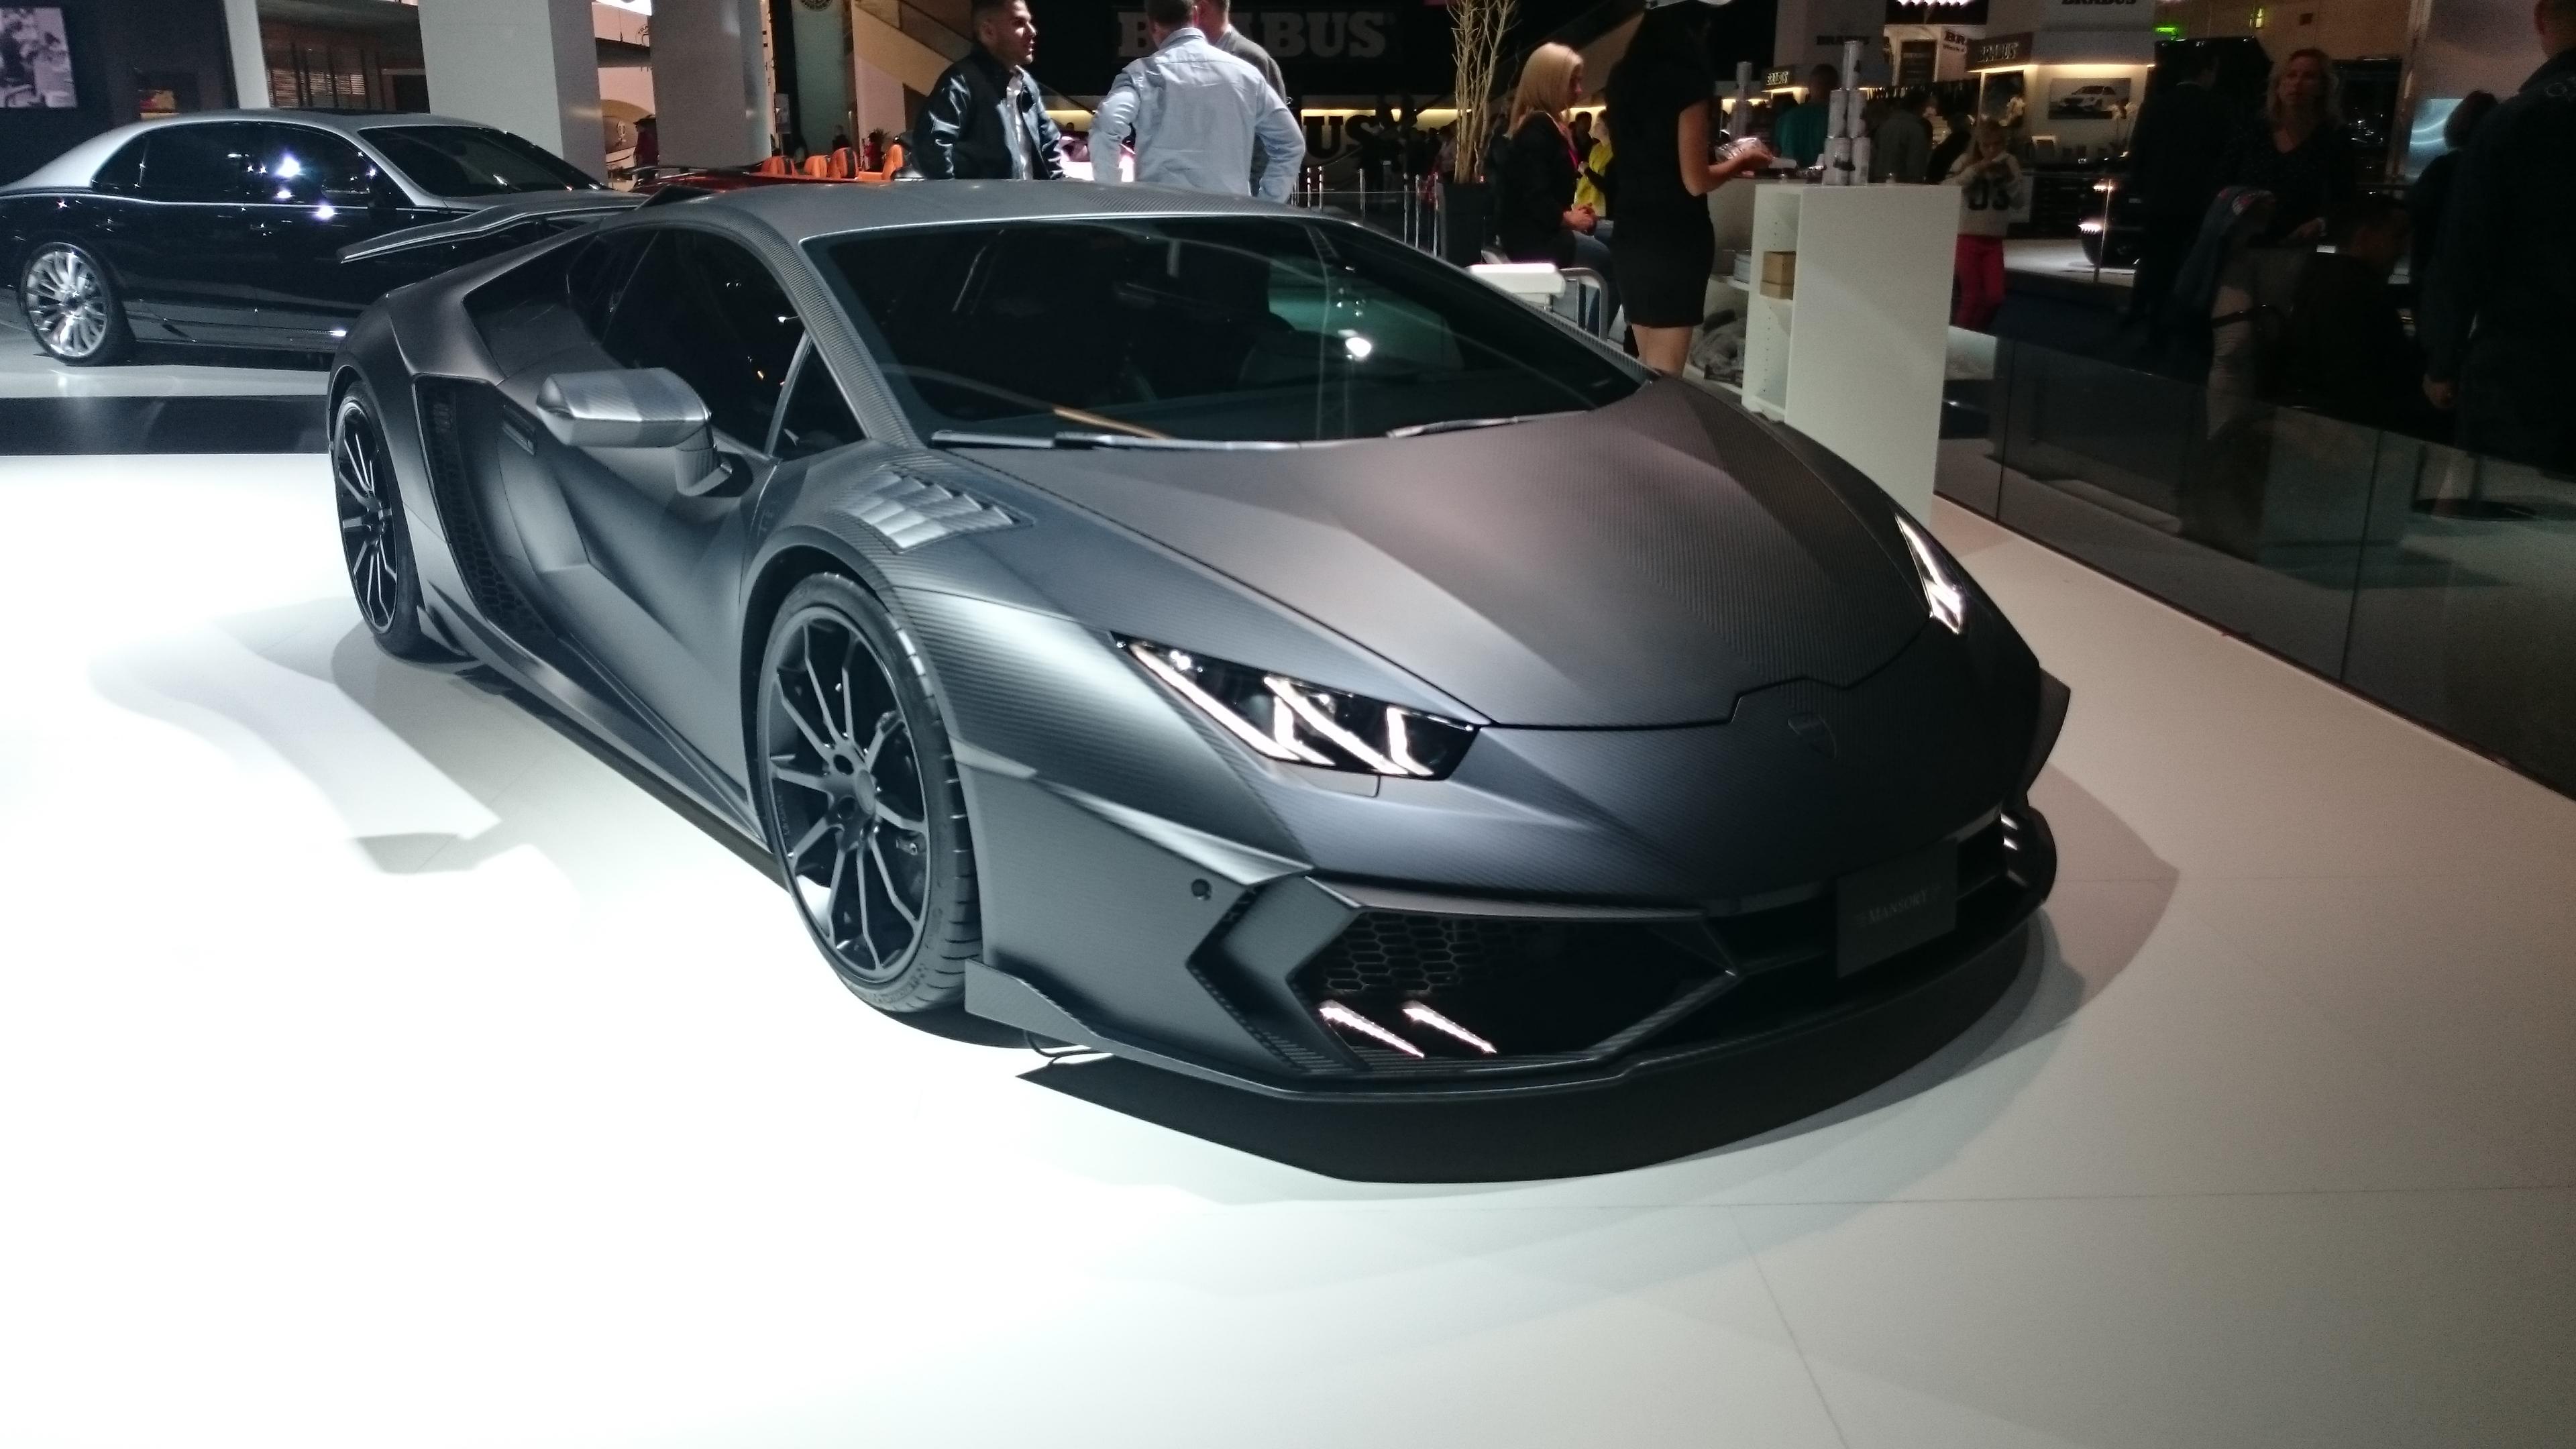 Fotos 360 del Lamborghini MANSORY CARBONADO BLACK STAR #VidePan en #IAA2015